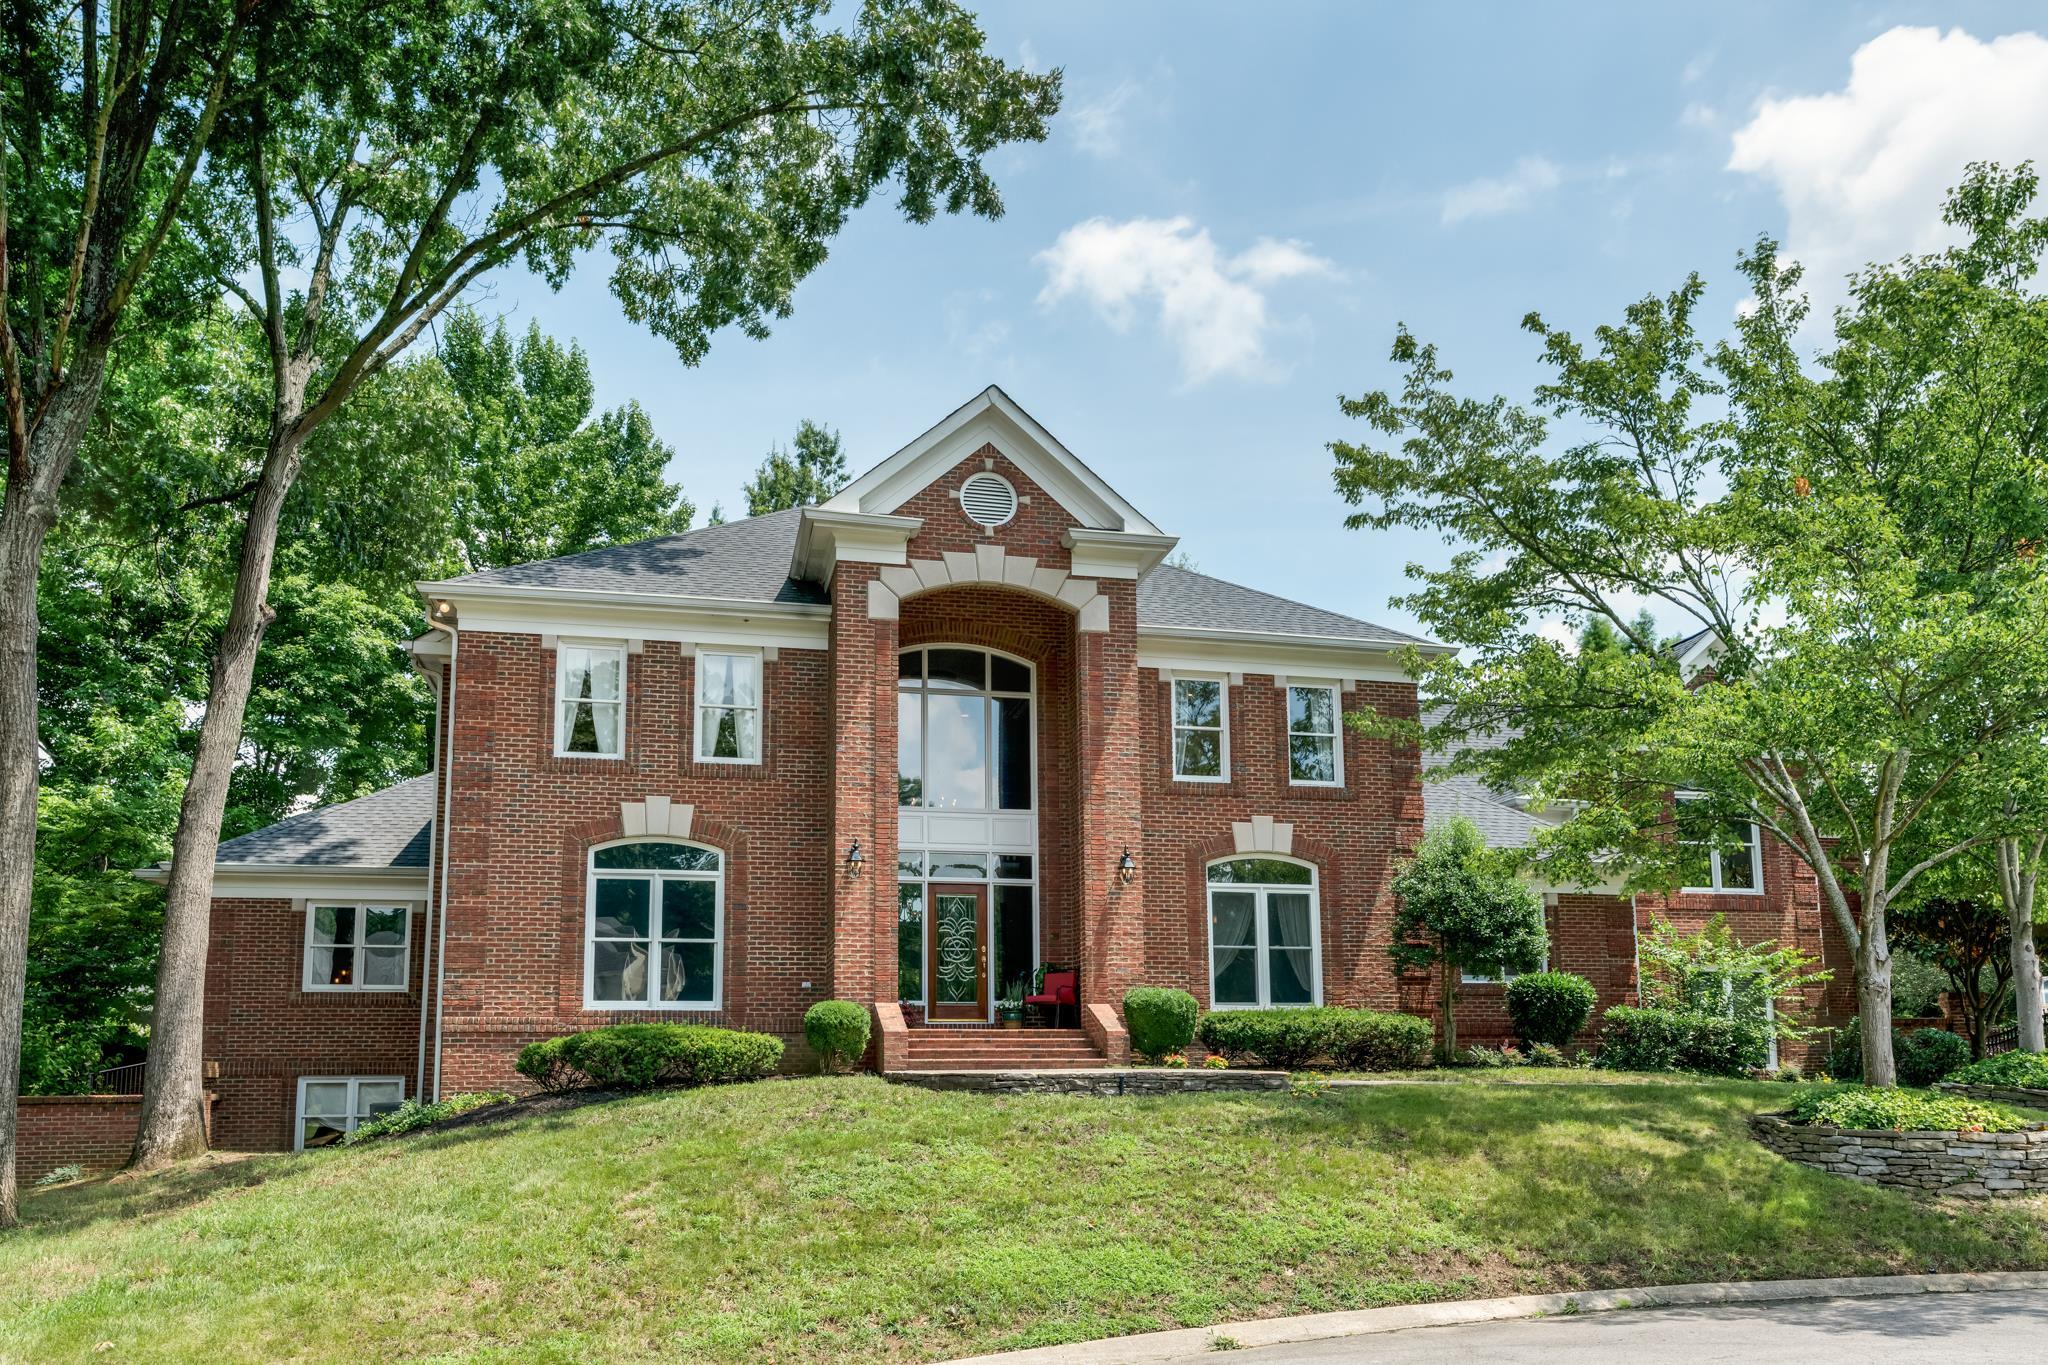 103 Hidden Way Ct, Hendersonville, TN 37075 - Hendersonville, TN real estate listing